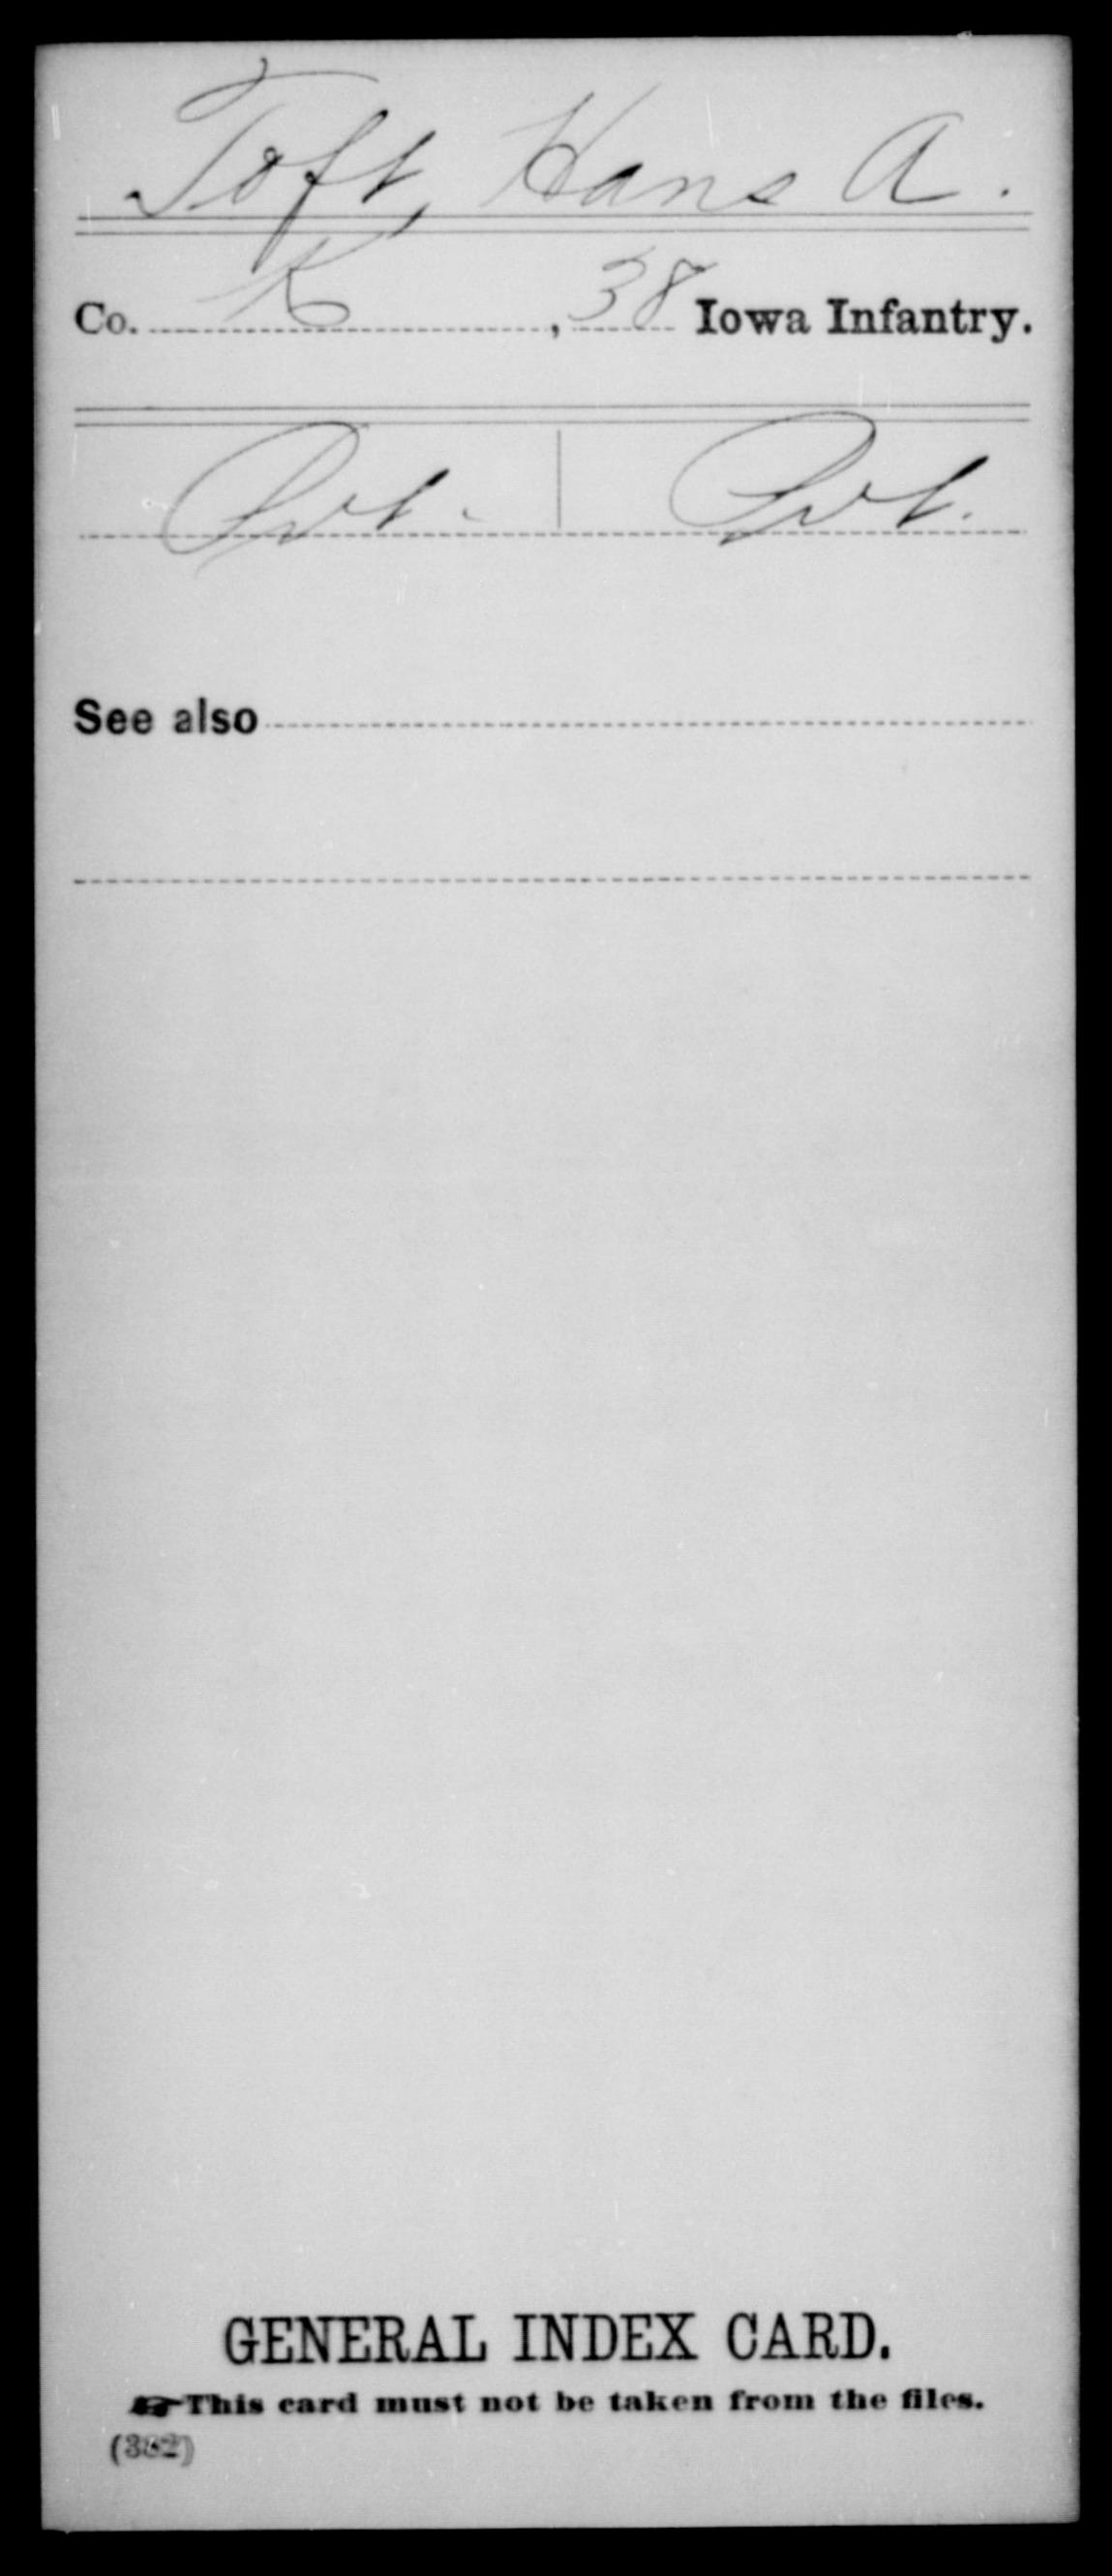 [Iowa] Toft, Hans A - 38th Infantry, Company K